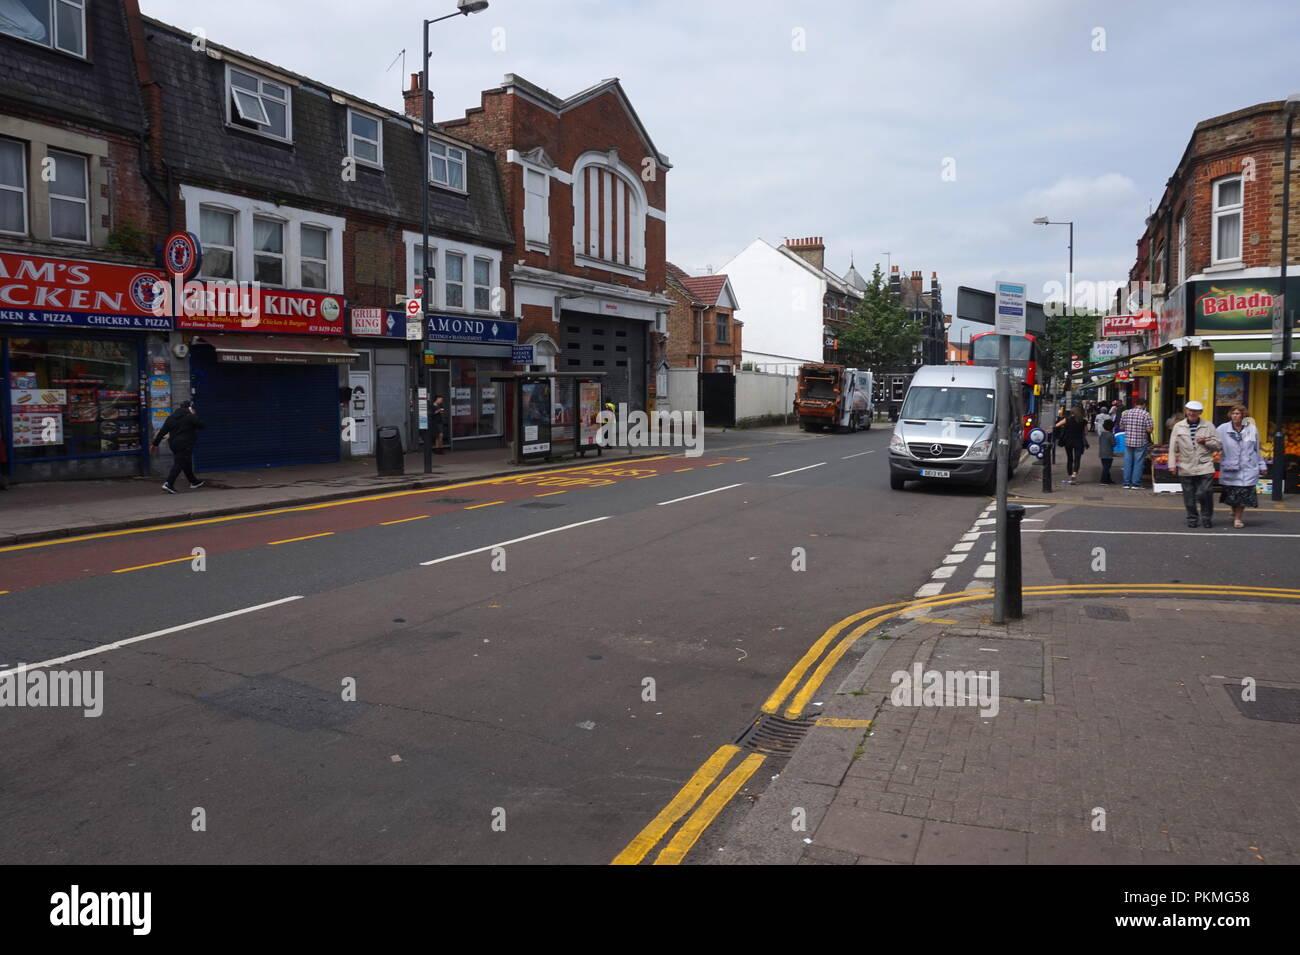 Willesden High Street, London, United Kingdom - Stock Image